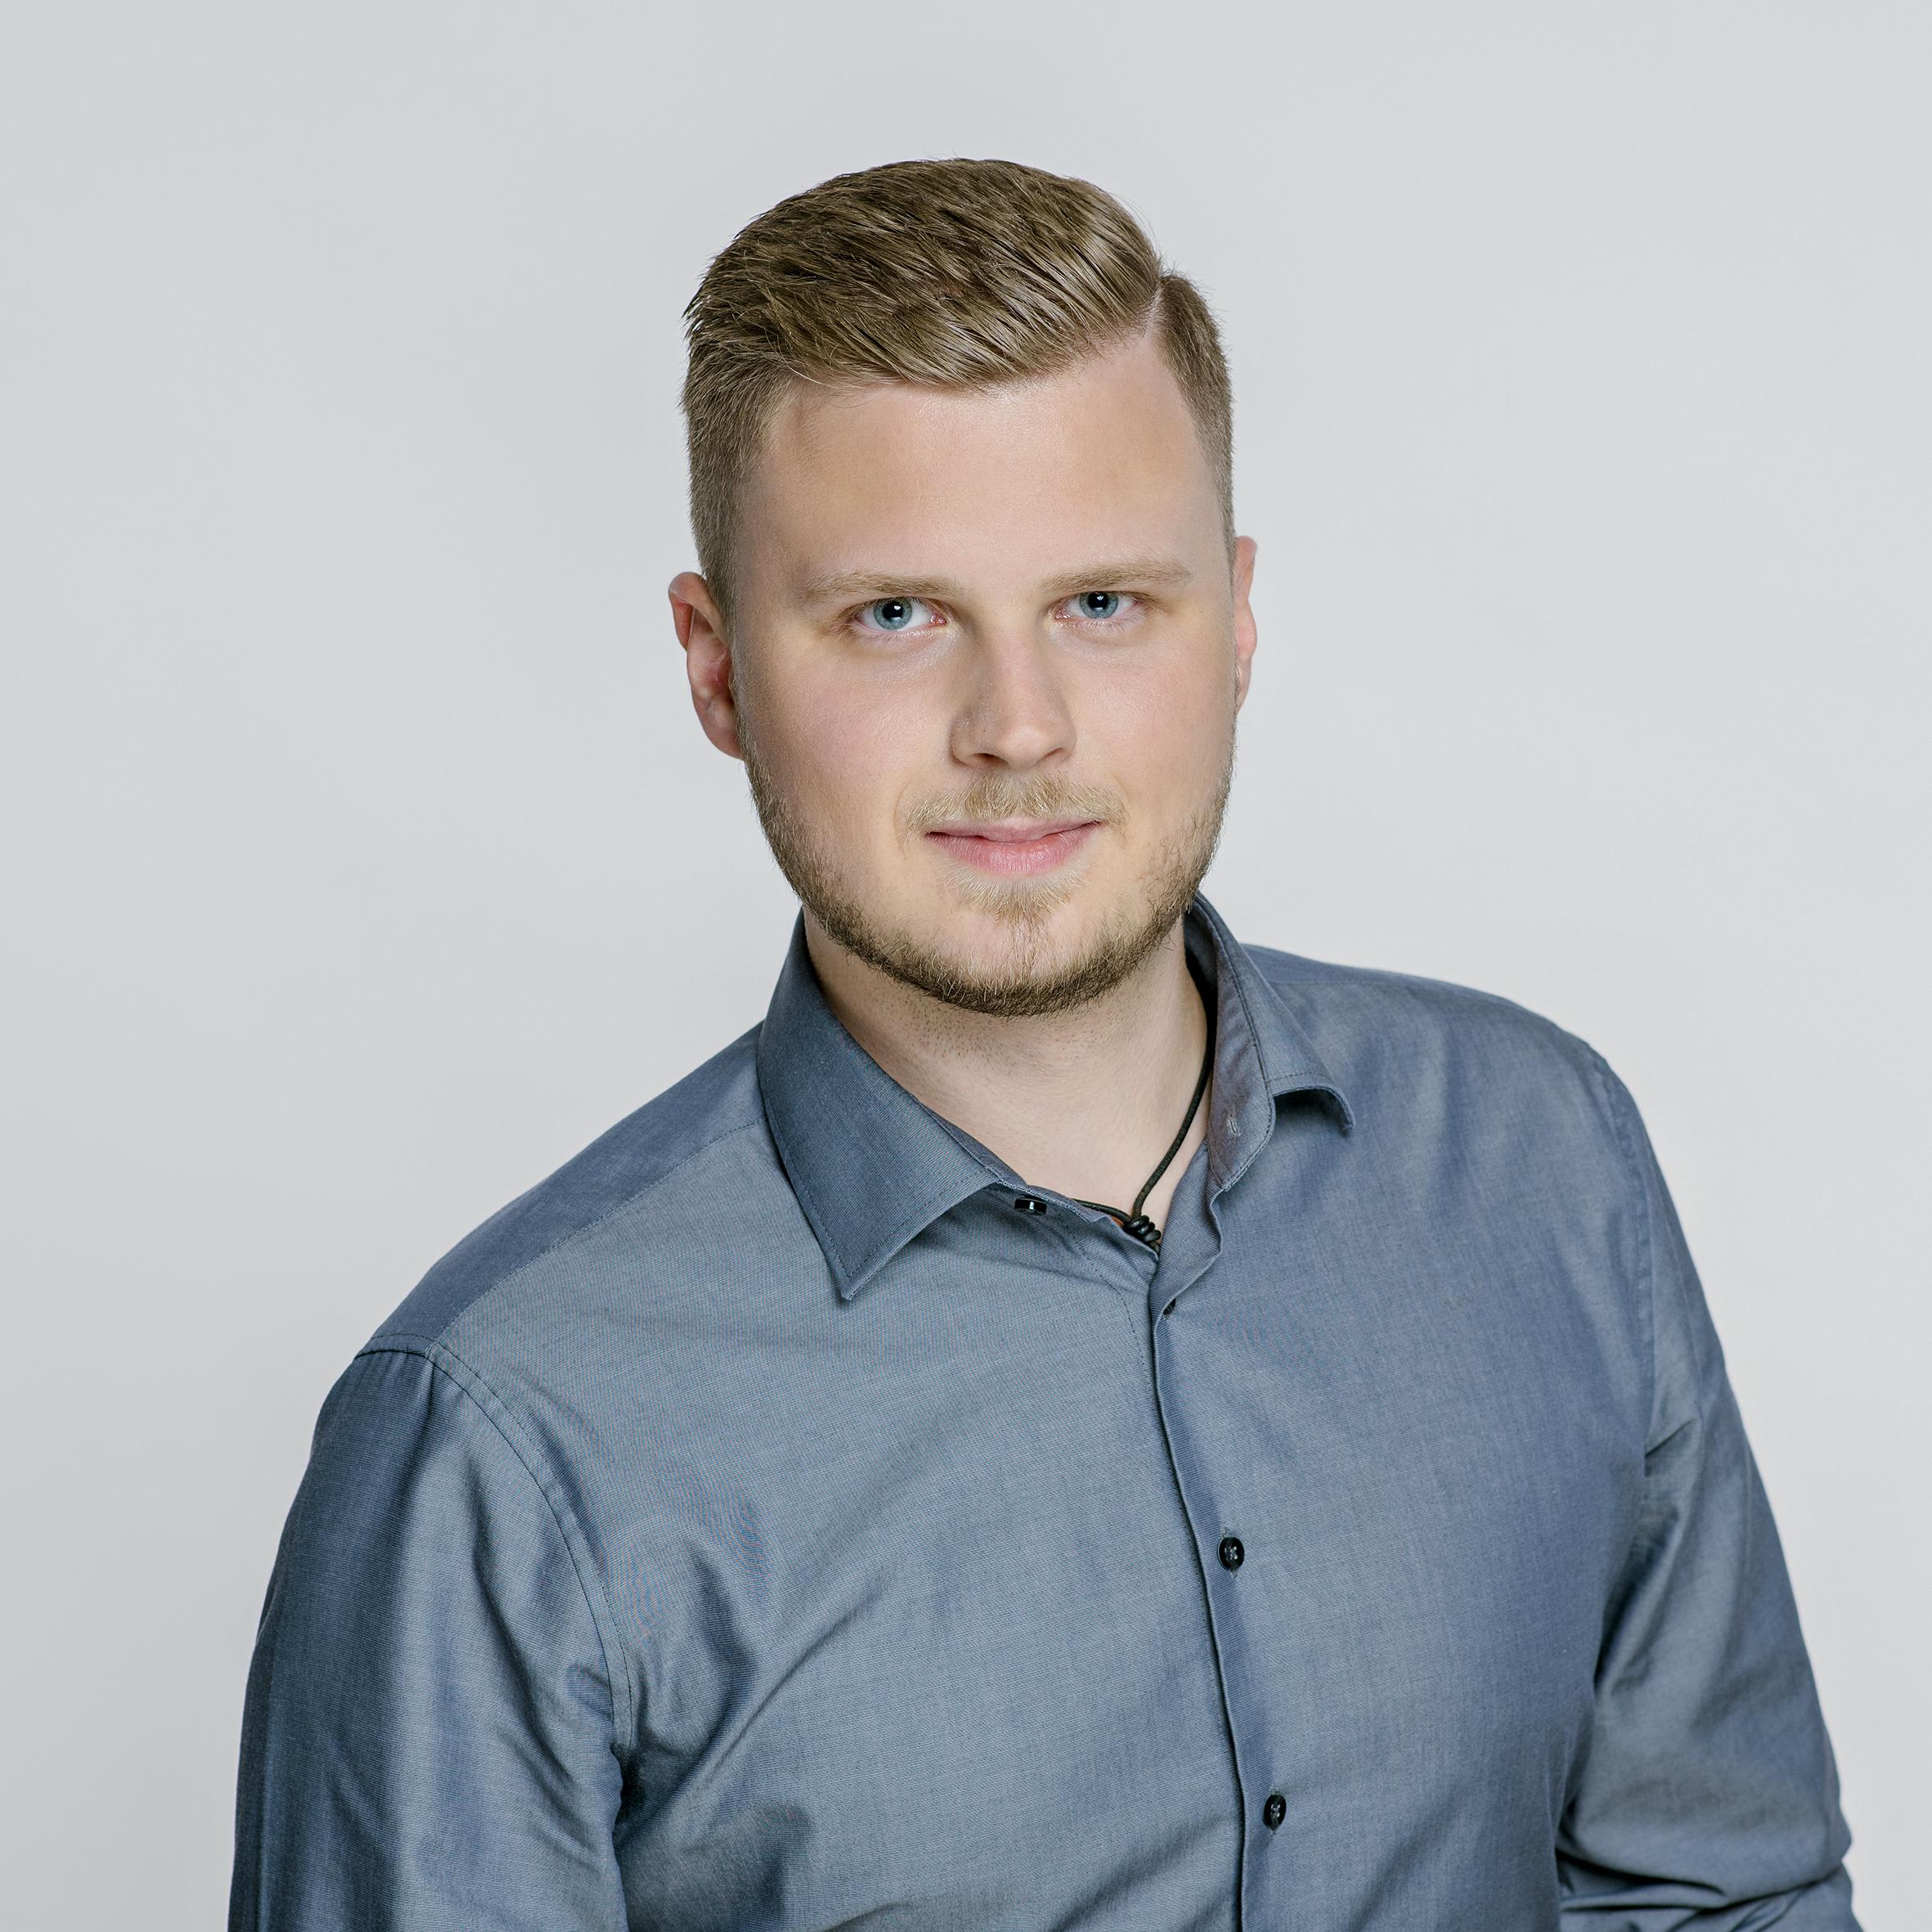 DanielHolzschuh